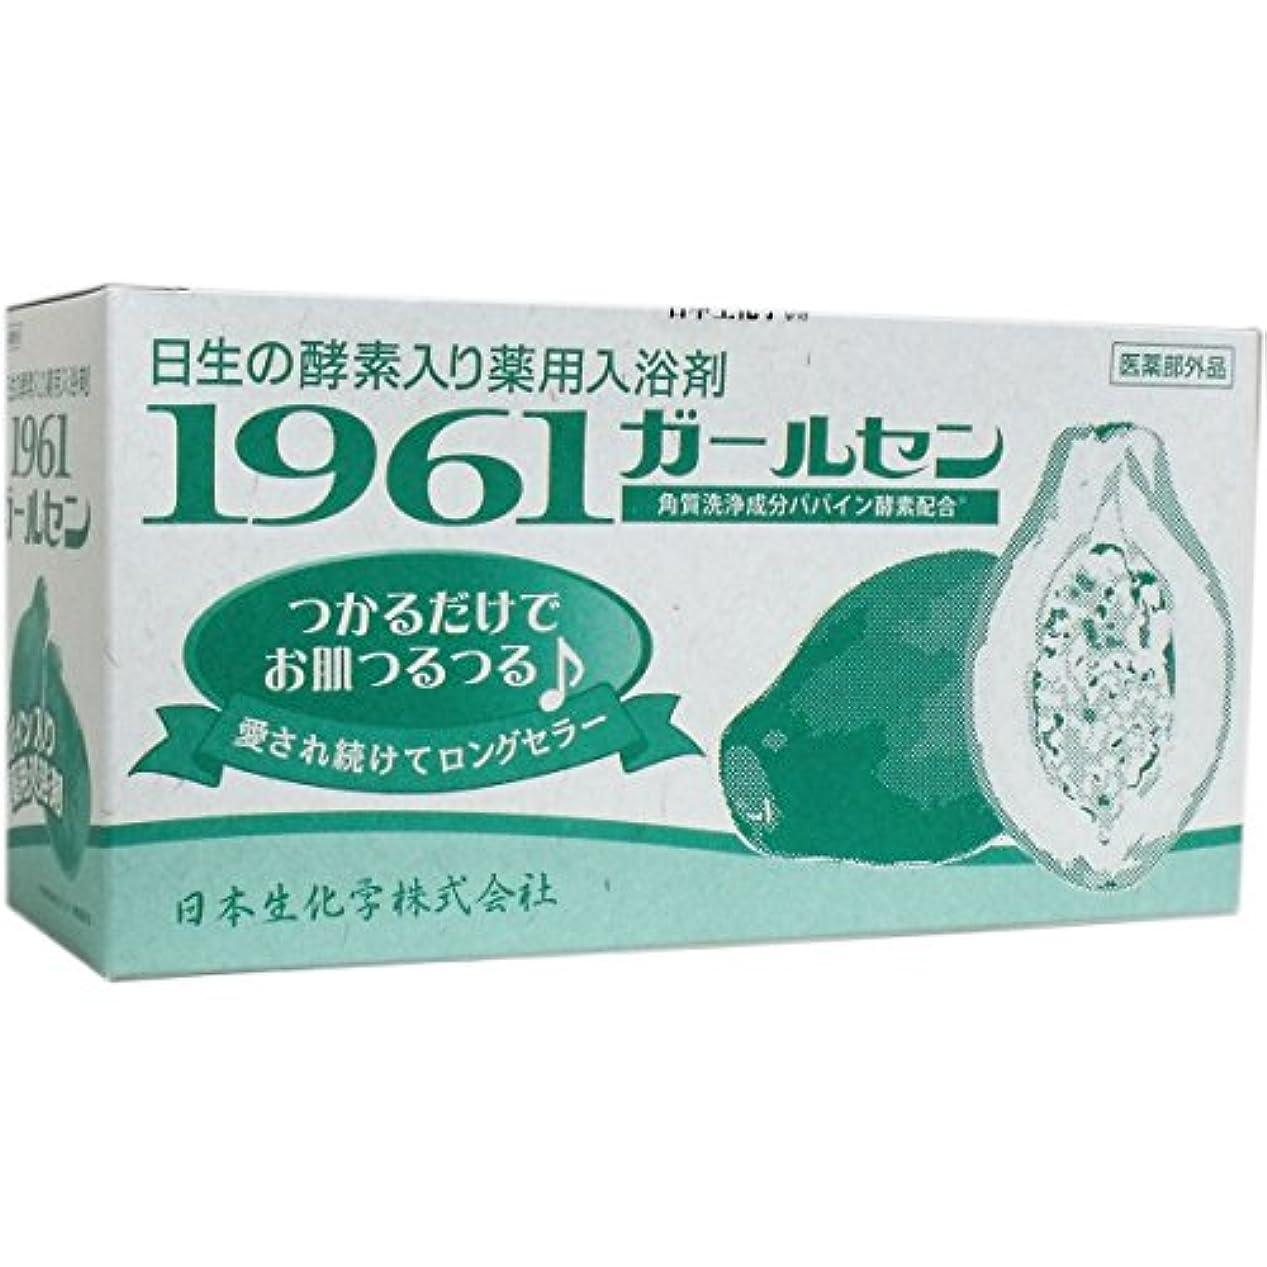 絶滅抽象贅沢日本生化学 酵素入り薬用入浴剤 1961ガールセン 30包入